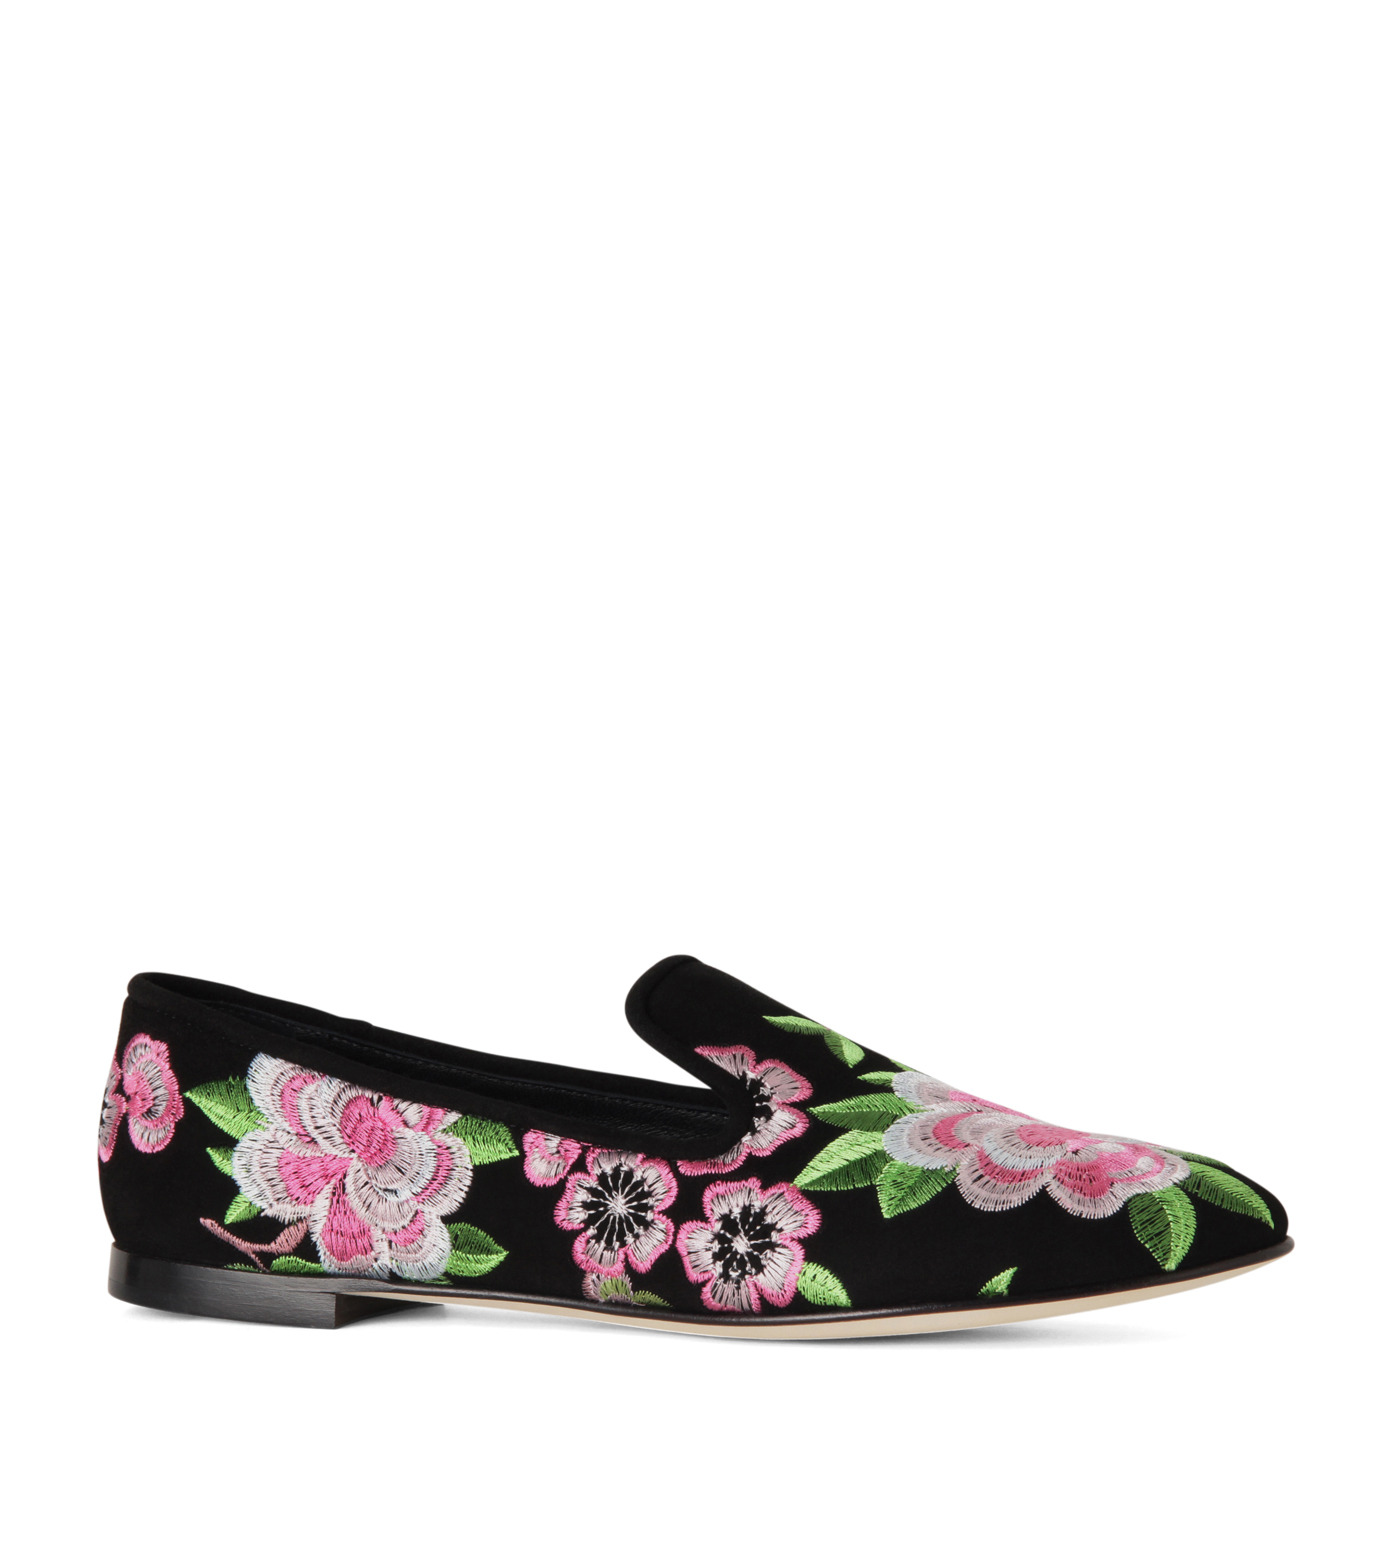 Giuseppe Zanotti Design(ジュゼッペザノッティ)のFlower Embro Opera Shoes-BLACK(シューズ/shoes)-41-6187CA005-13 拡大詳細画像1